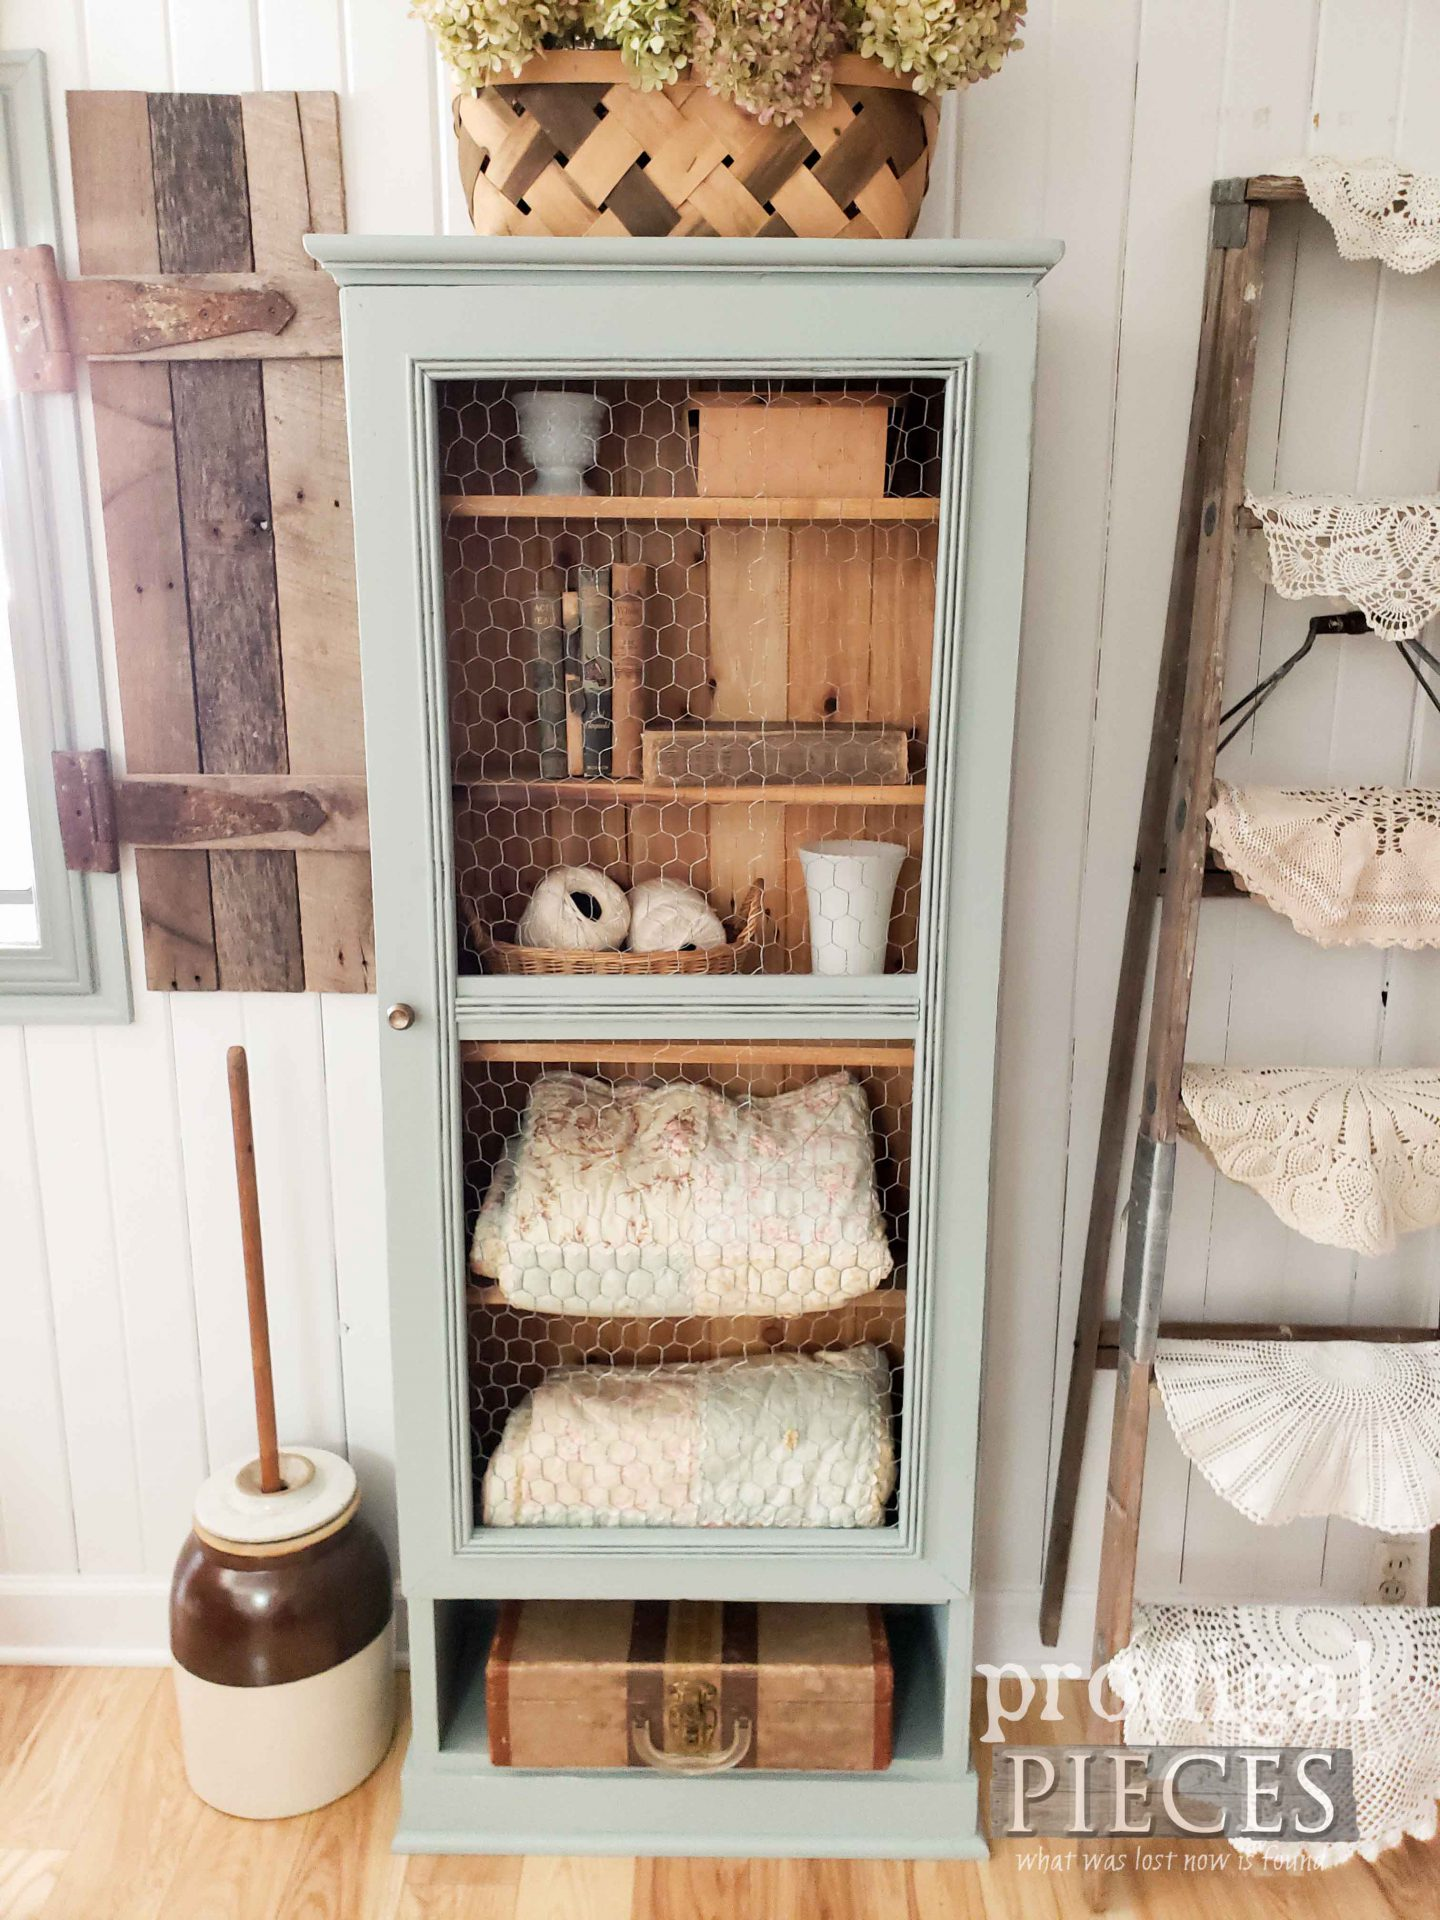 Handmade Farmhouse Style Cupboard by Larissa of Prodigal Pieces | prodigalpieces.com #prodigalpieces #home #homedecor #farmhouse #furniture